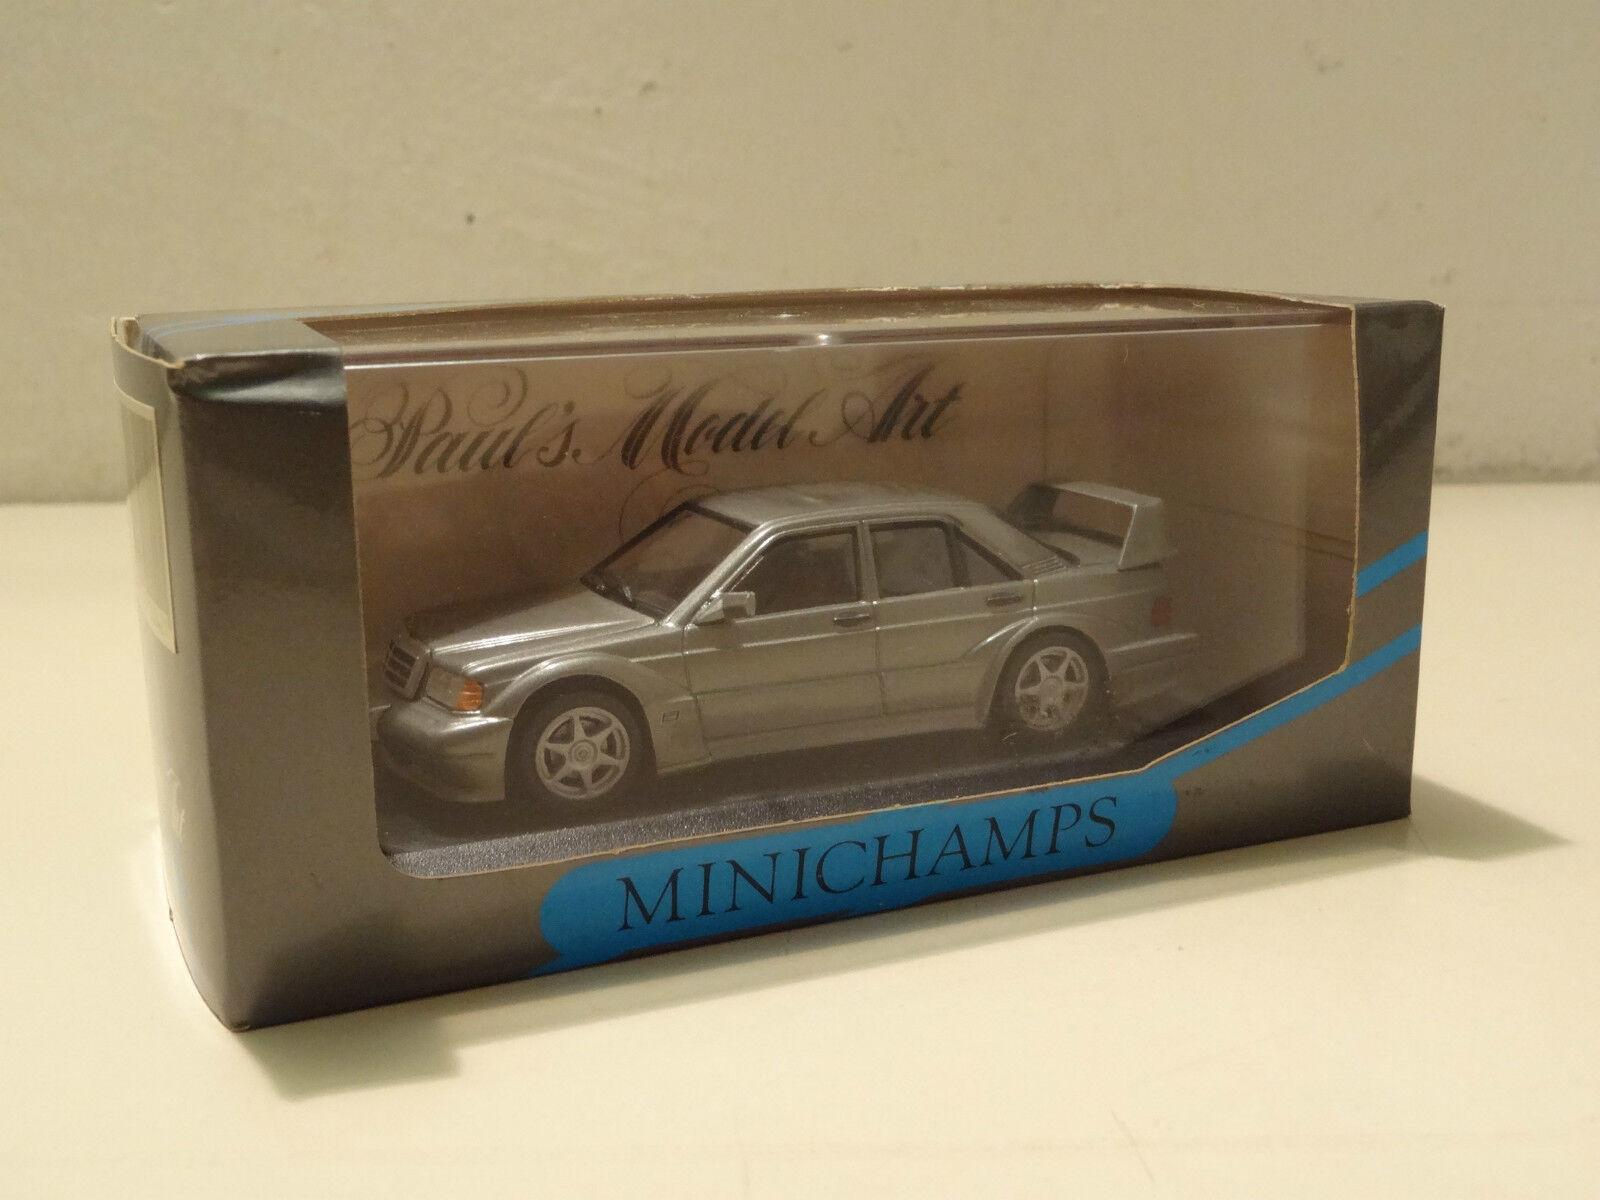 Mercedes-benz 190 e evo 2 Street Pearl gris met. - Minichamps 1 43